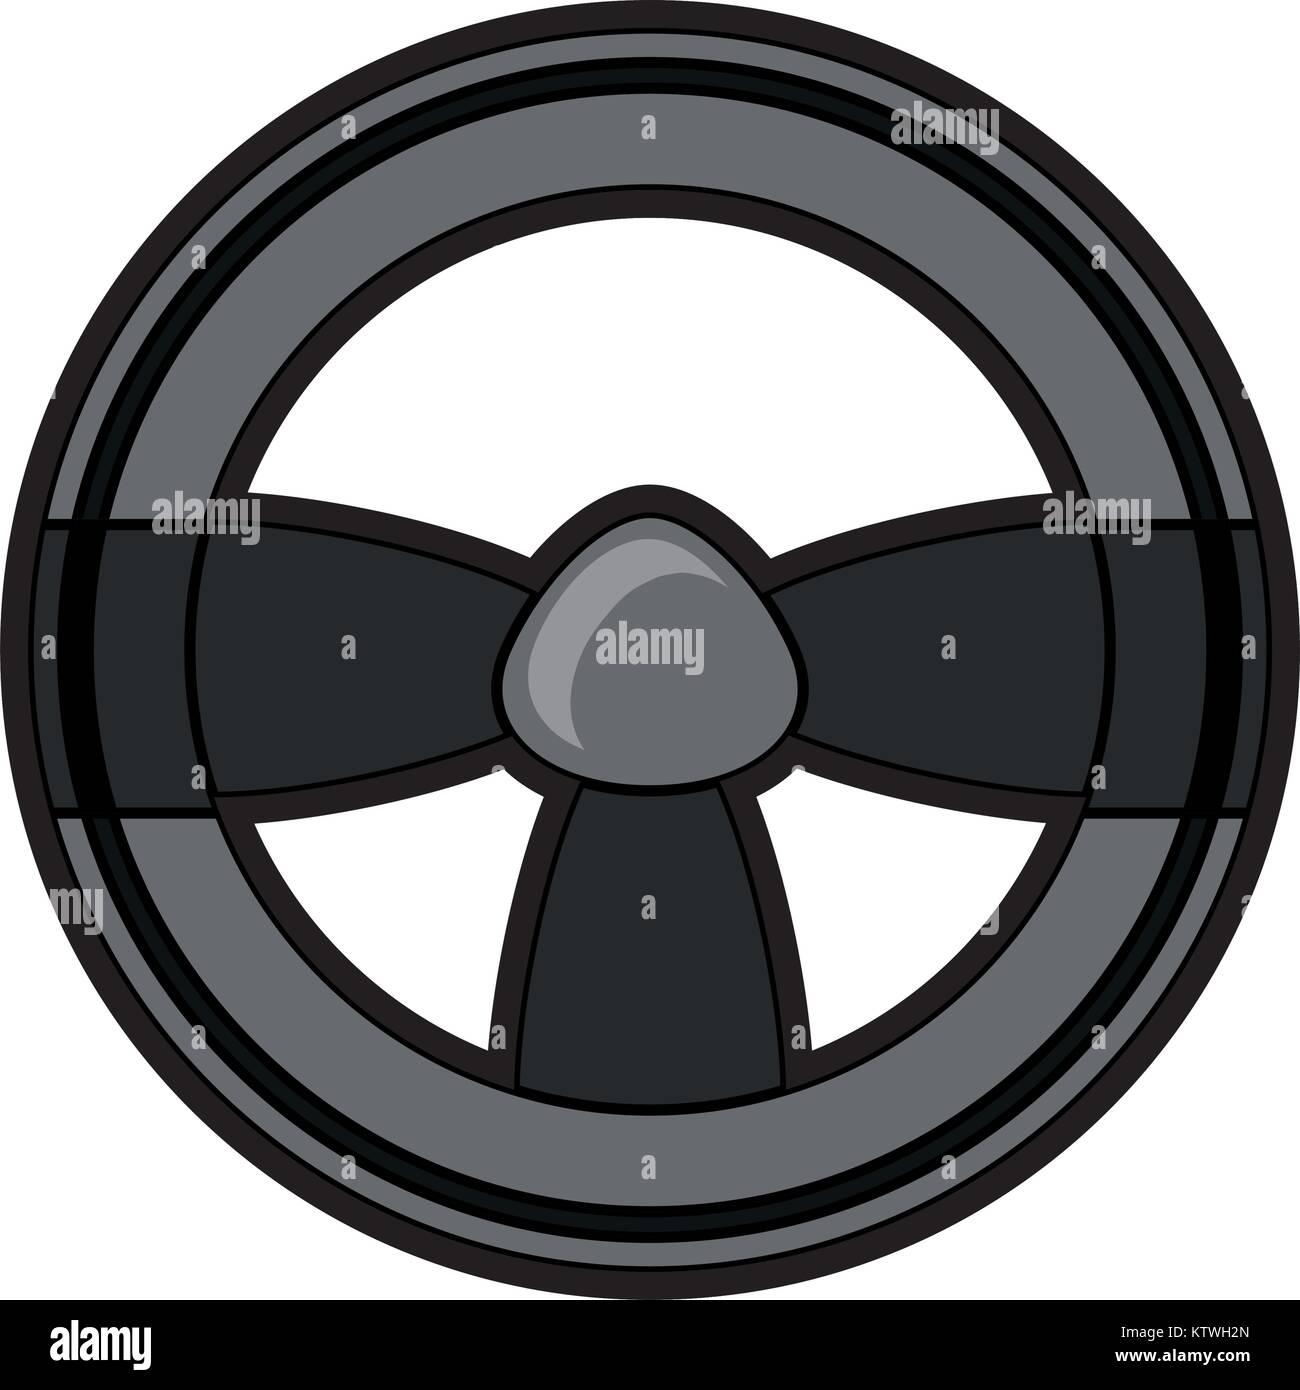 Tractor Steering Wheel Clip Art : Steering wheel graphic stock photos